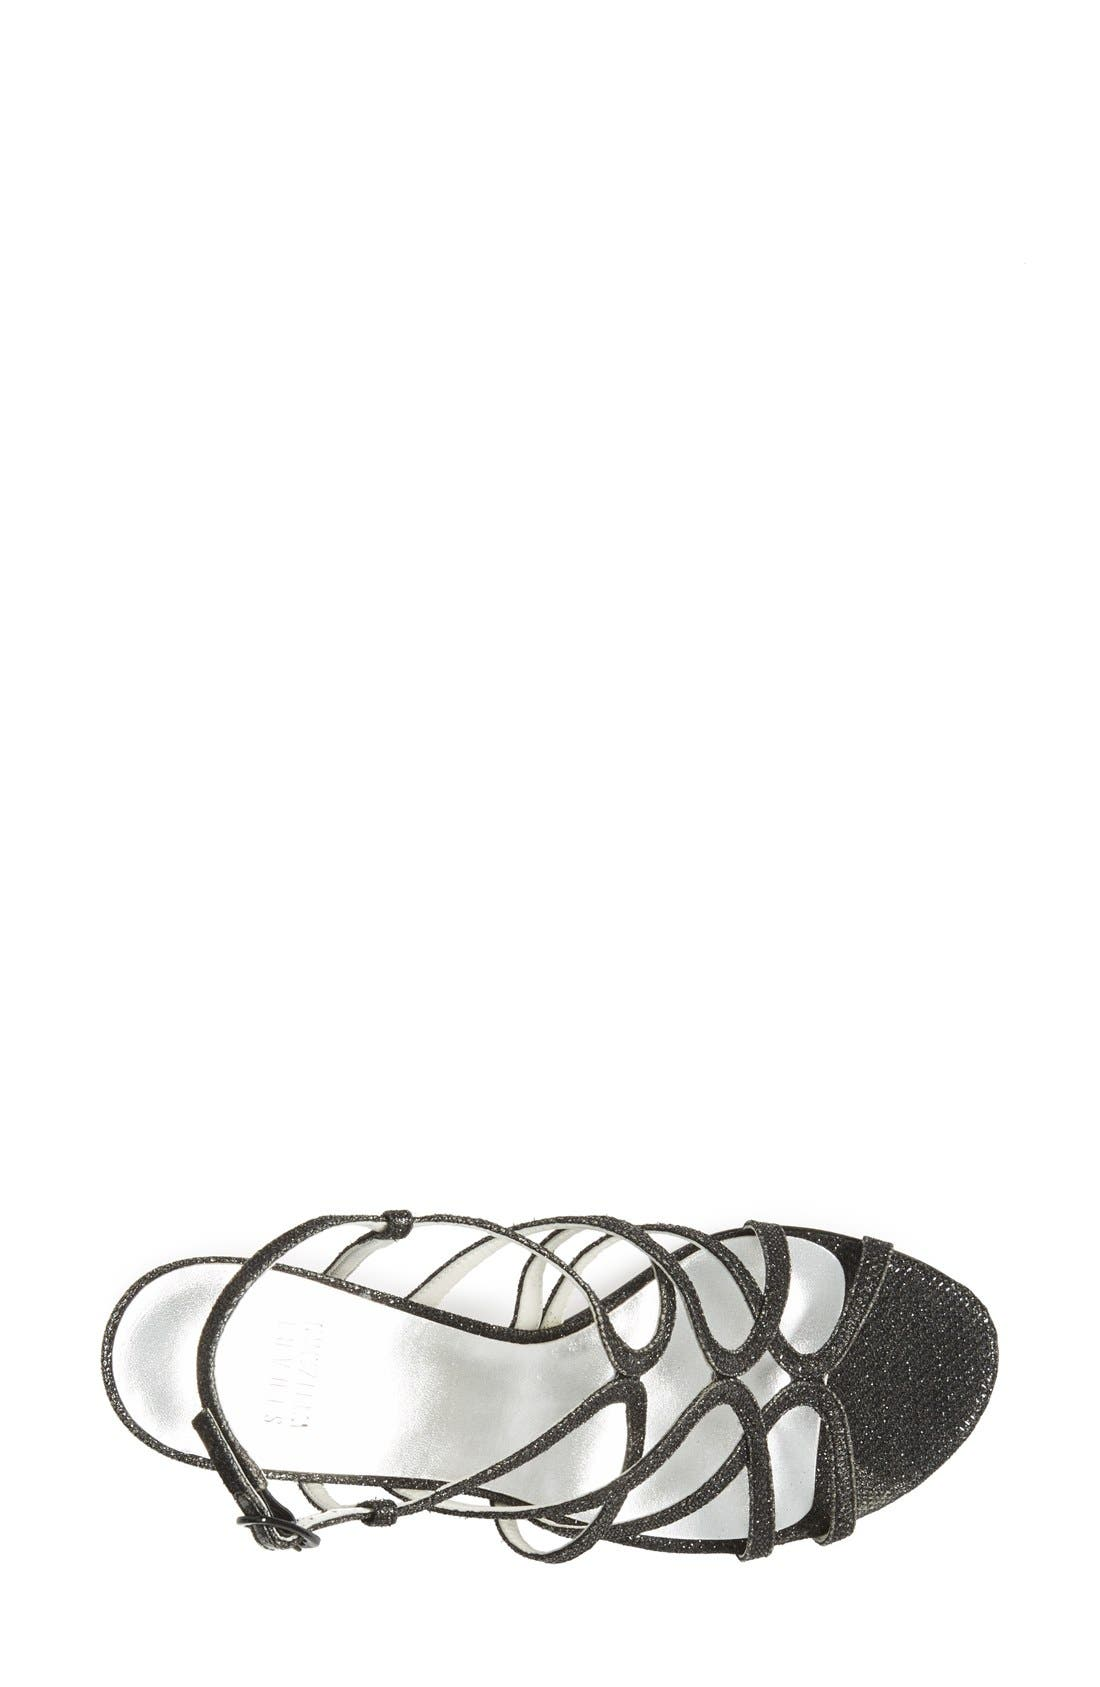 STUART WEITZMAN, 'Turningup' Sandal, Alternate thumbnail 3, color, 004